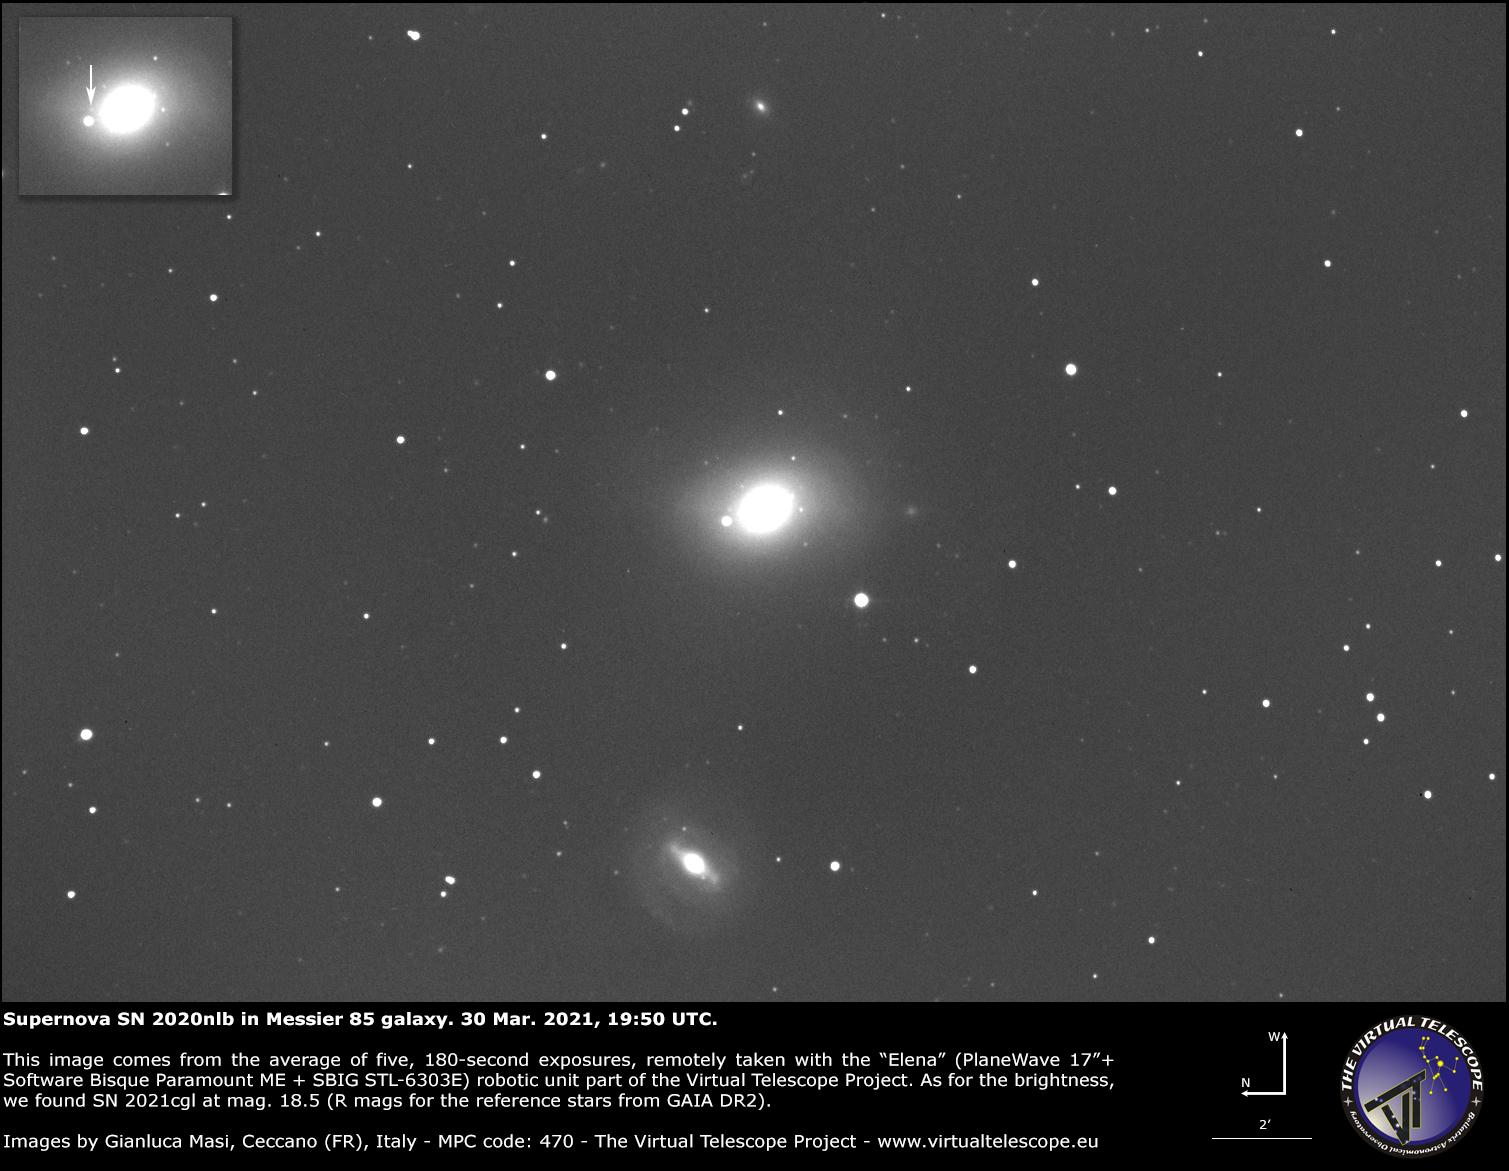 Supernova SN 2020nlb in Messier 85: an image - 30 Mar. 2021.